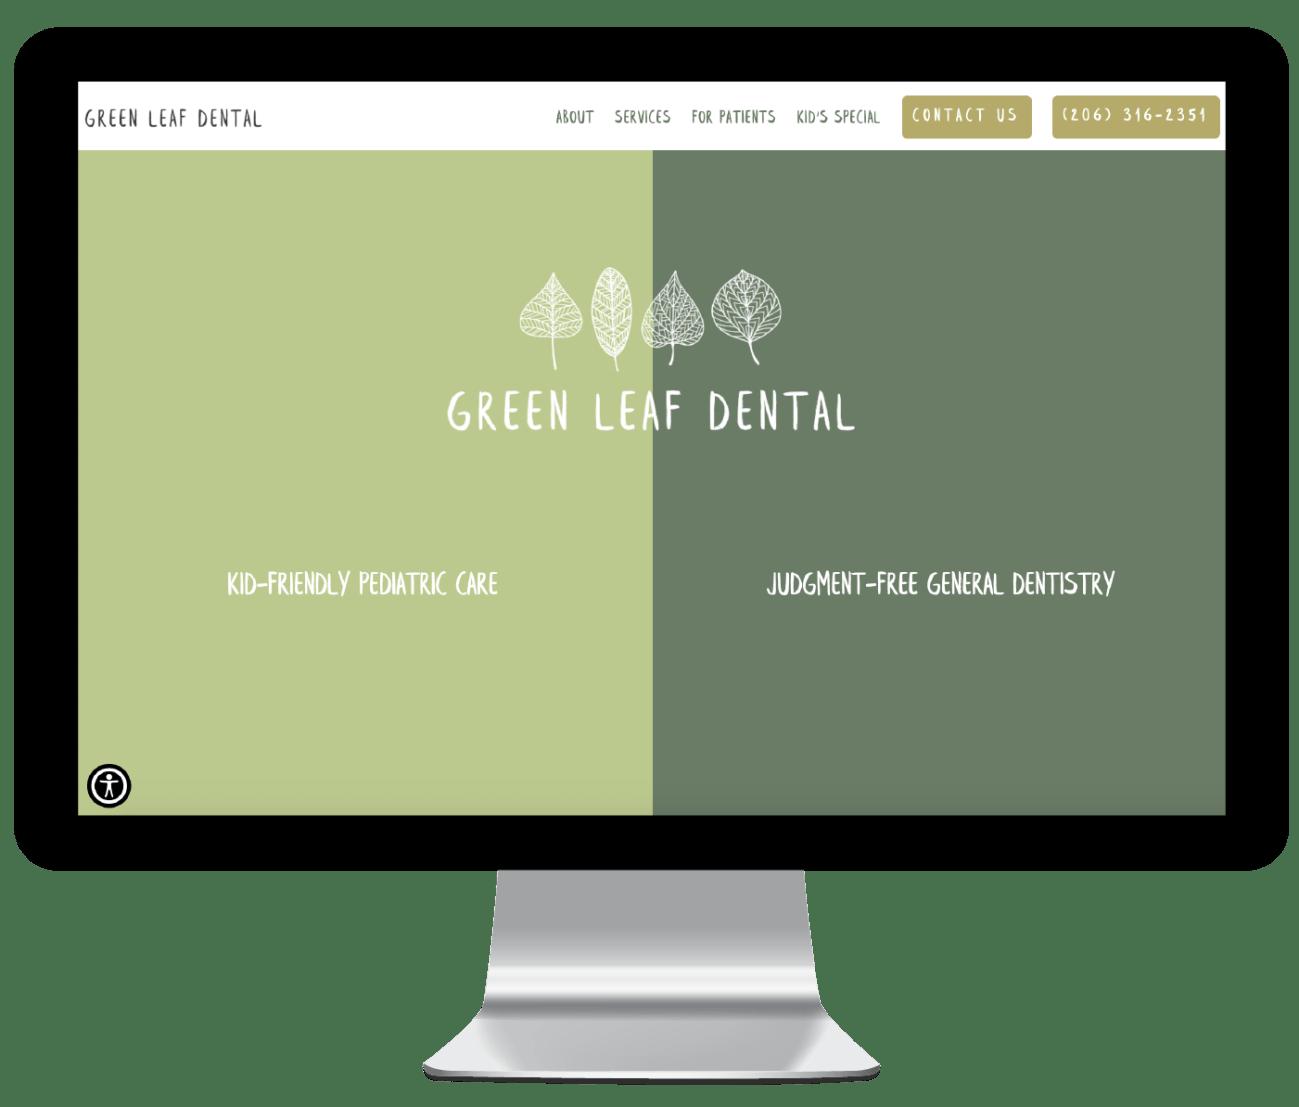 Green Leaf Dental branding